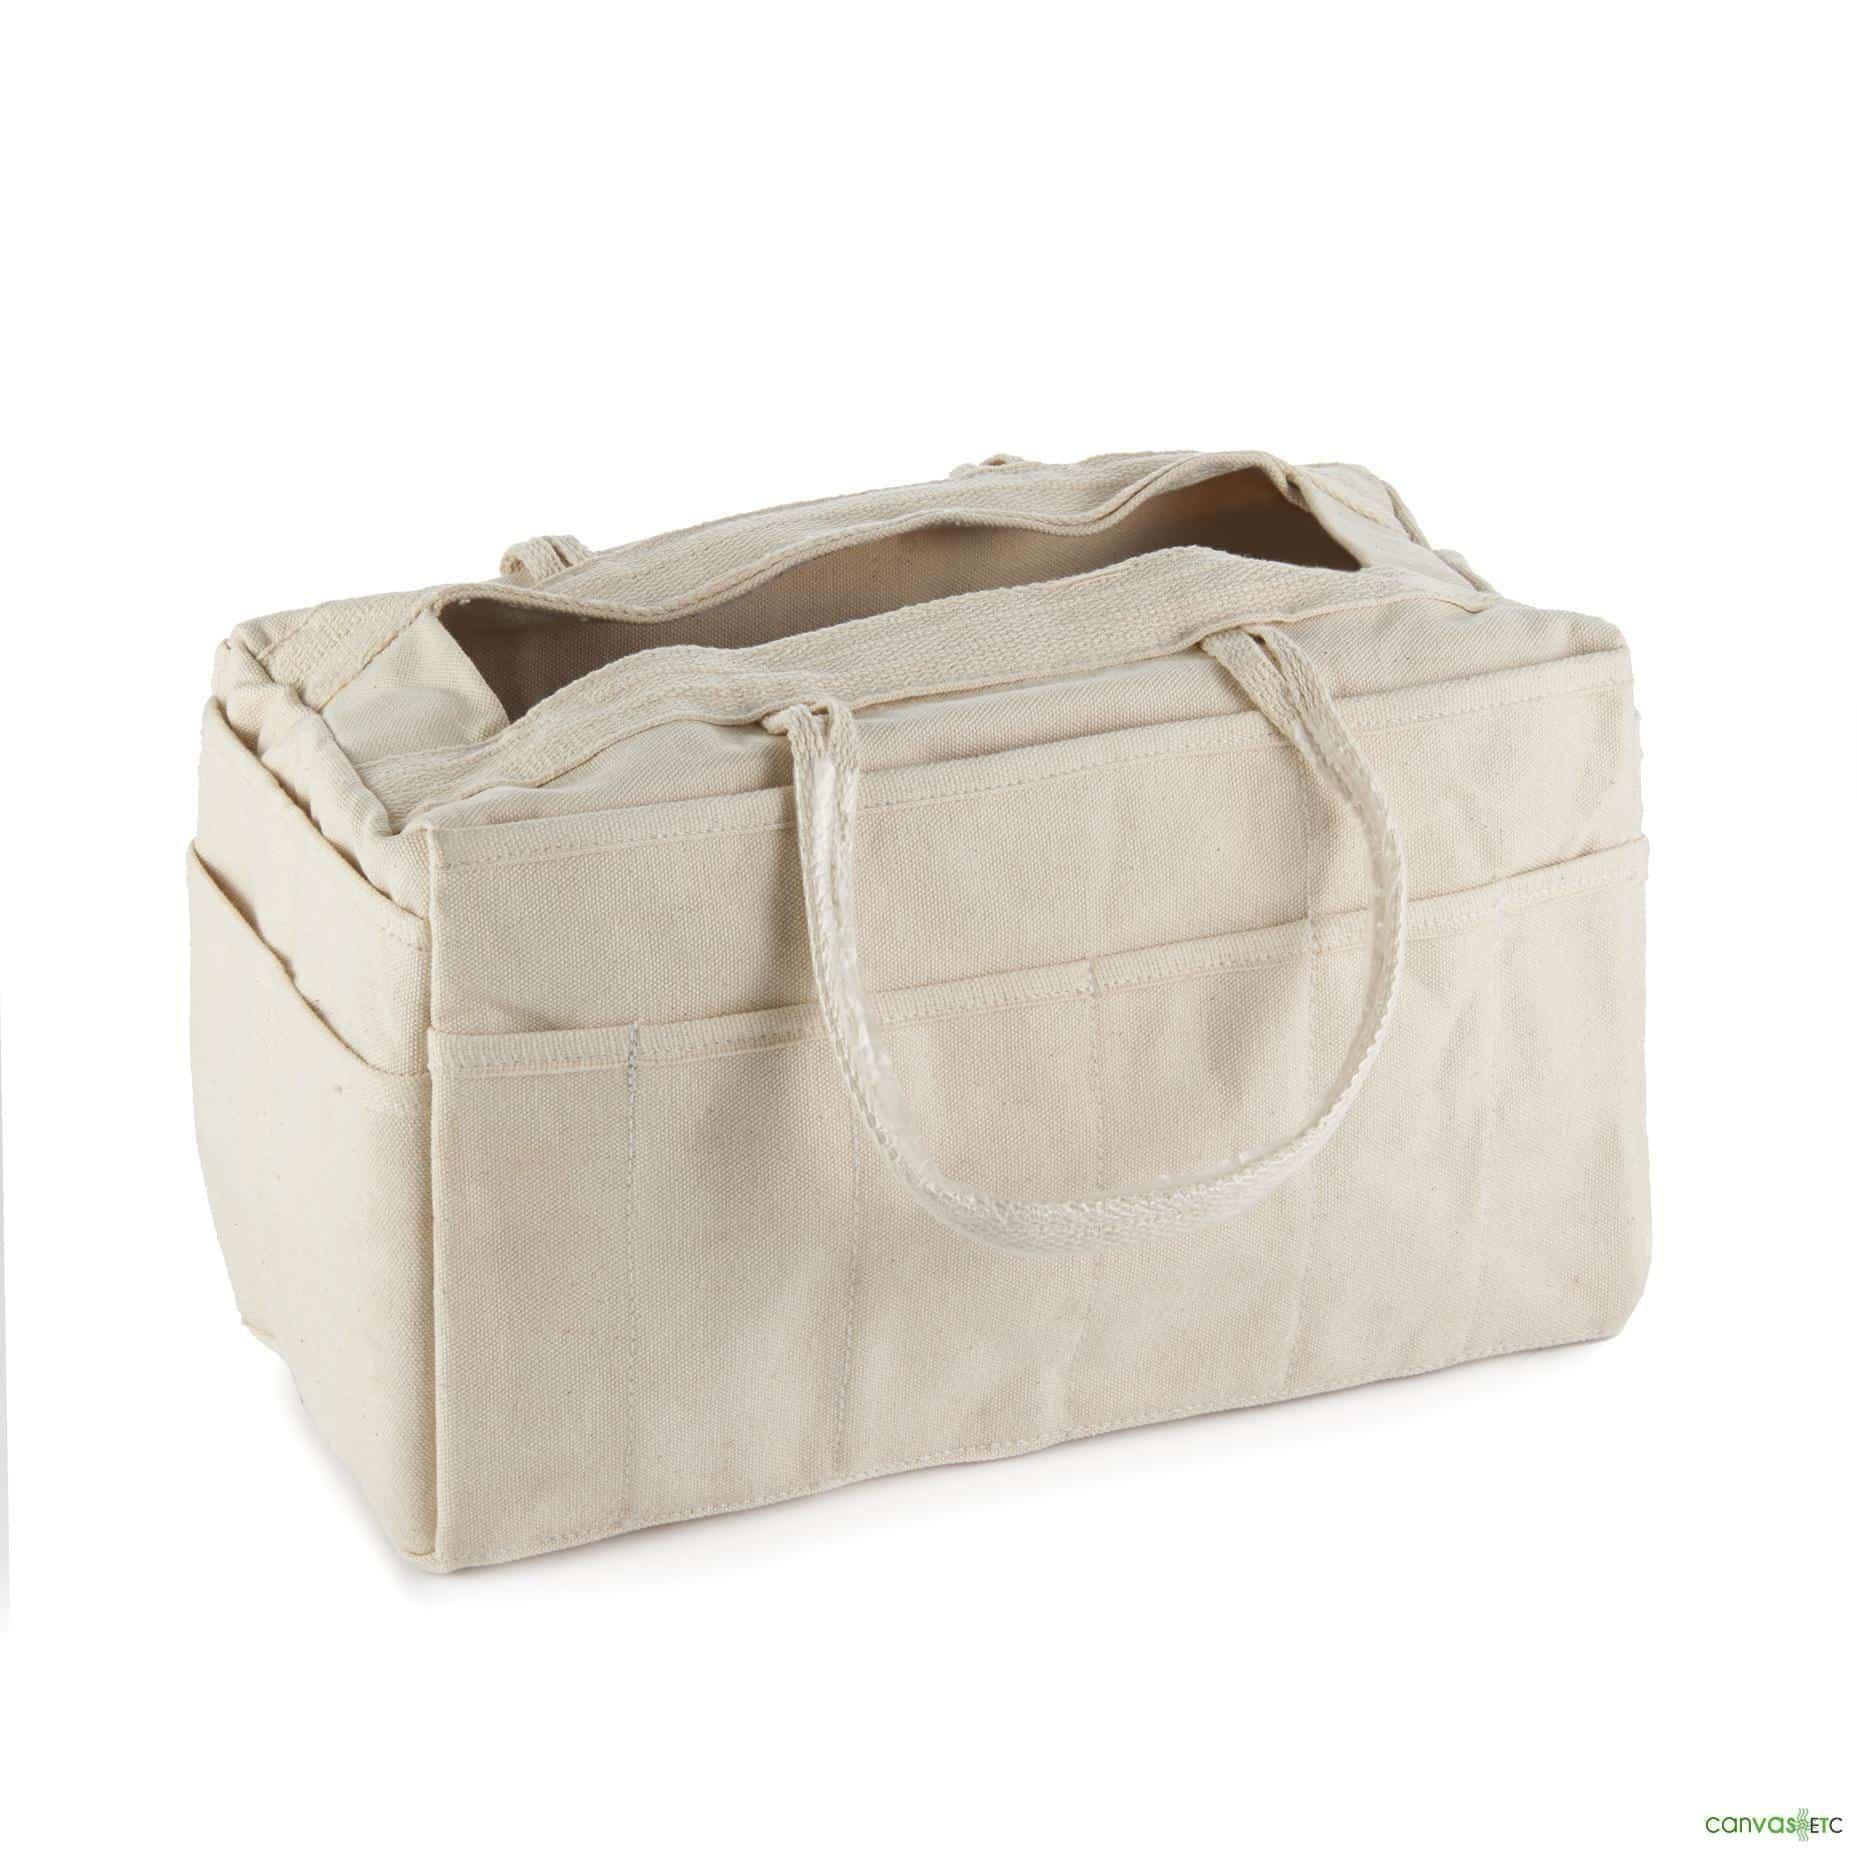 Rigger Bag 18oz Cotton Duck Fabric Canvas Etc